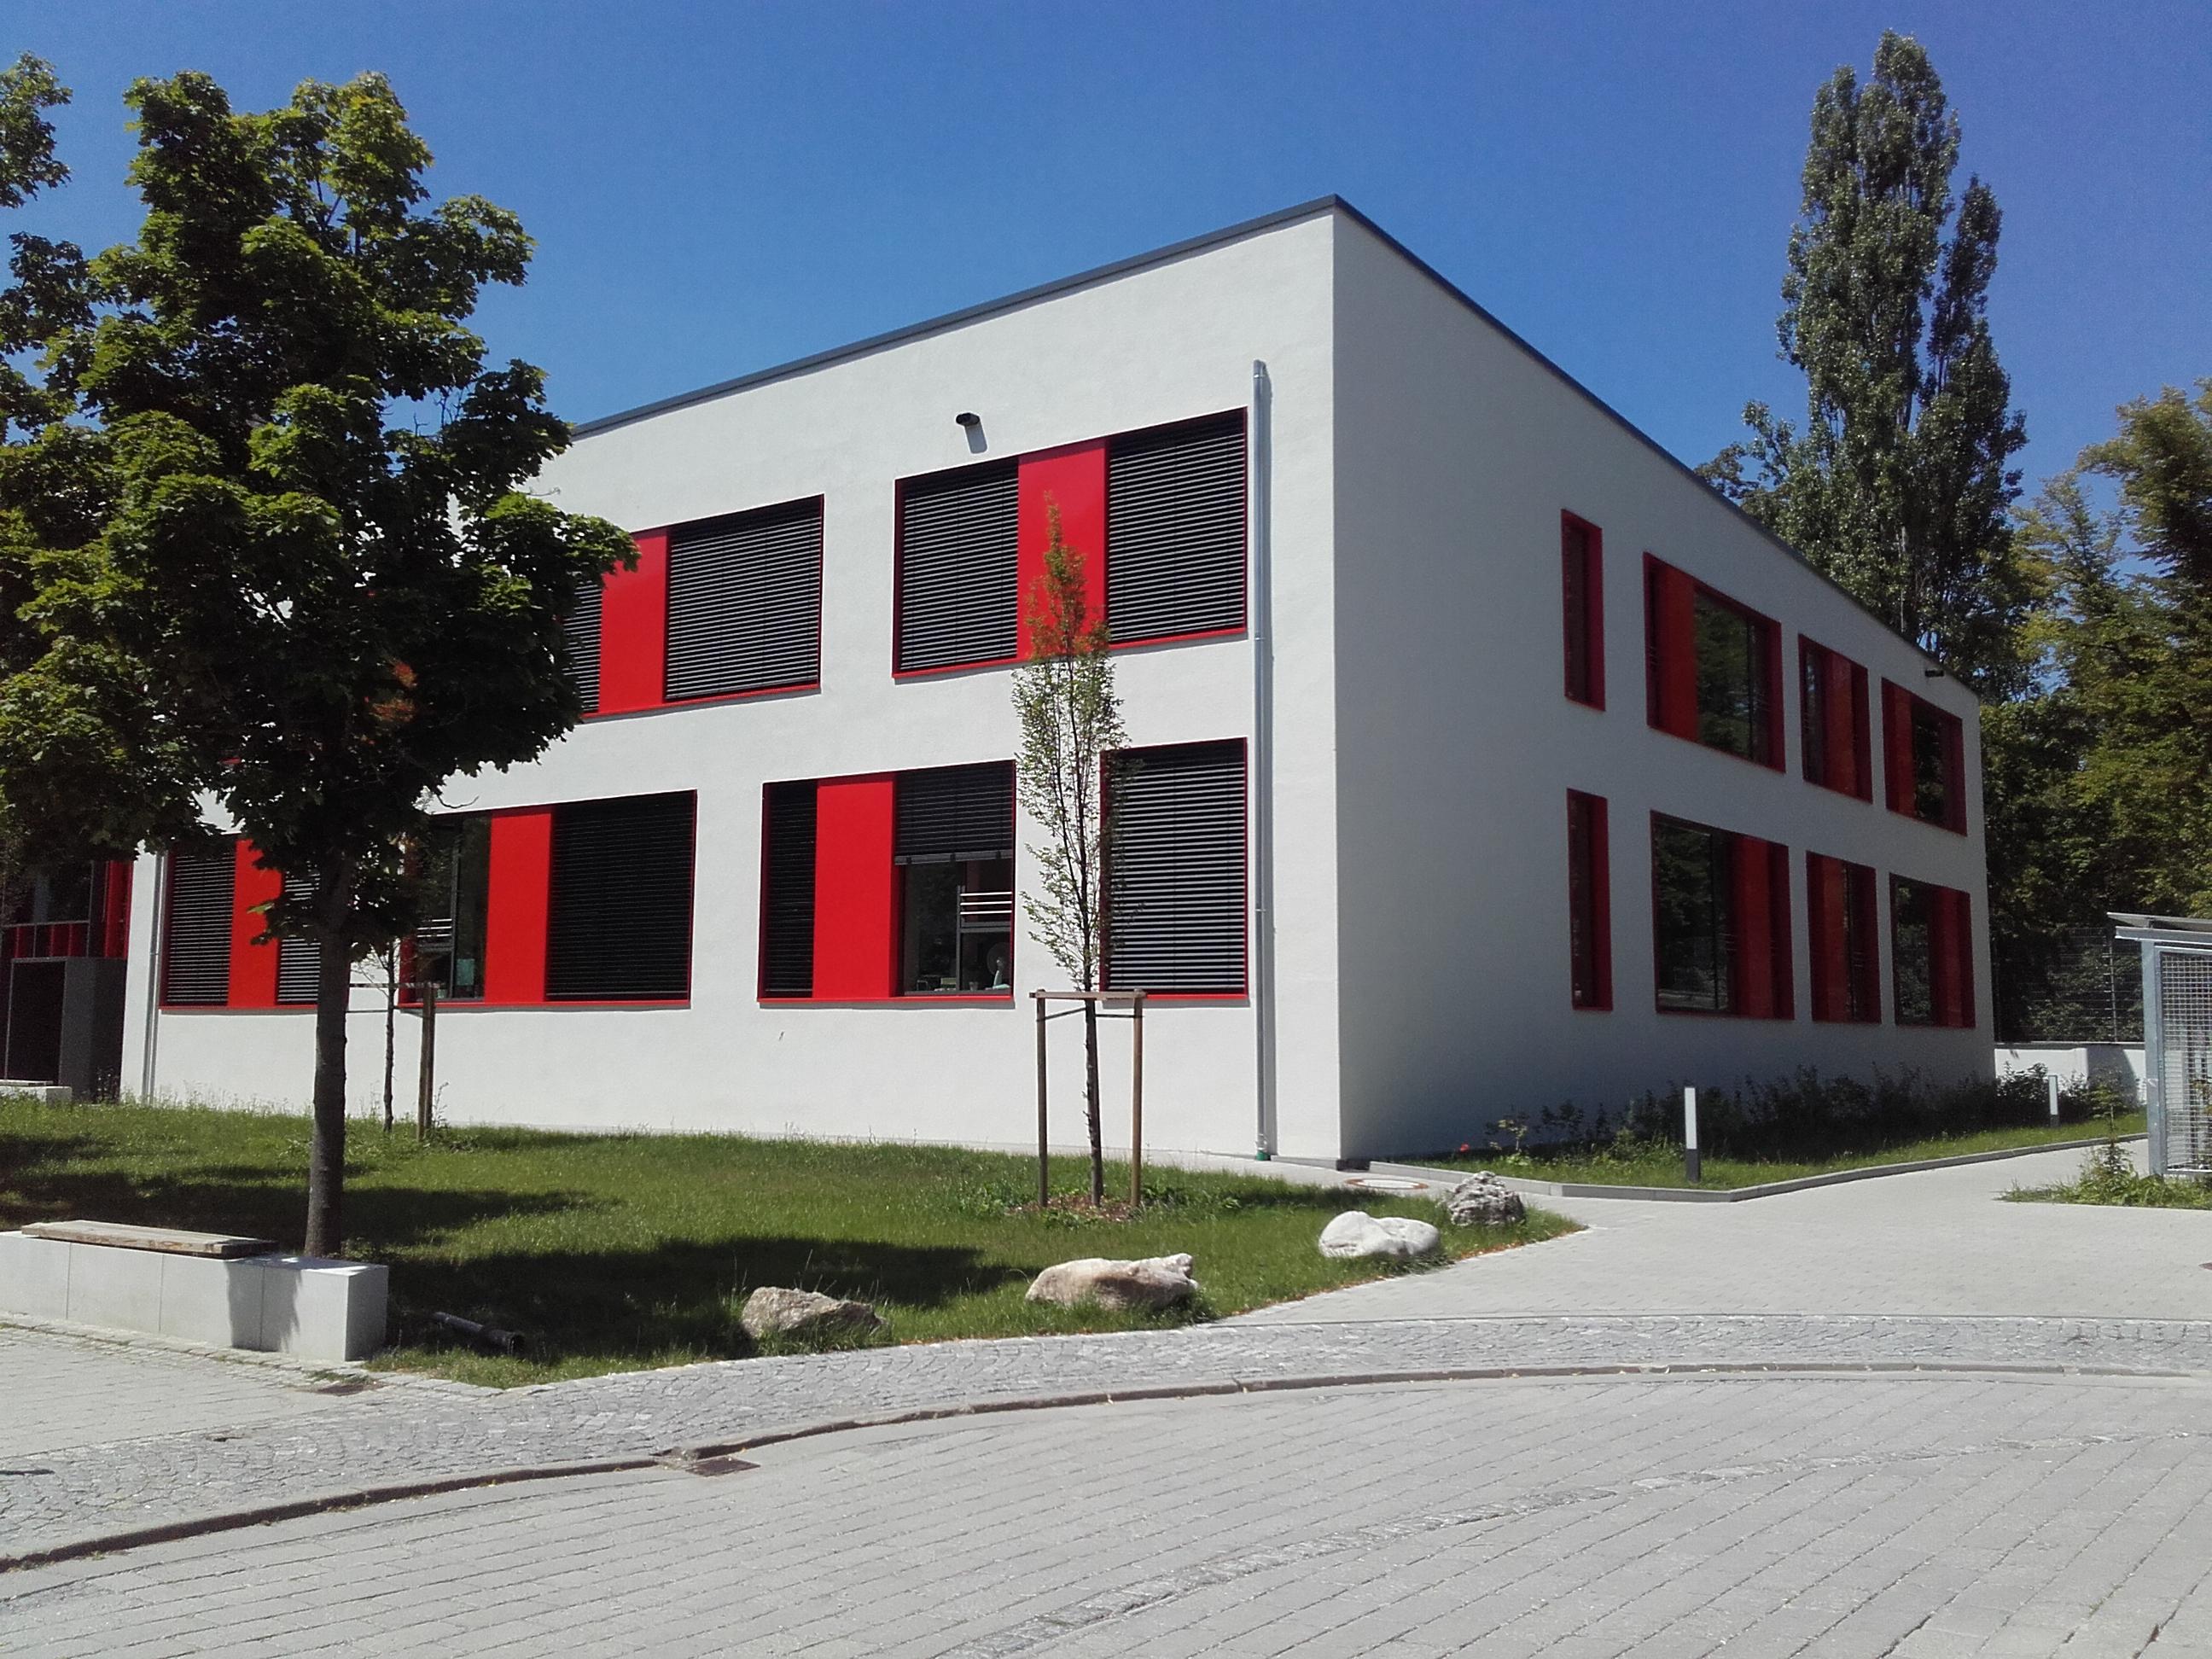 Caritas Krankenhaus St Josef Regensburg